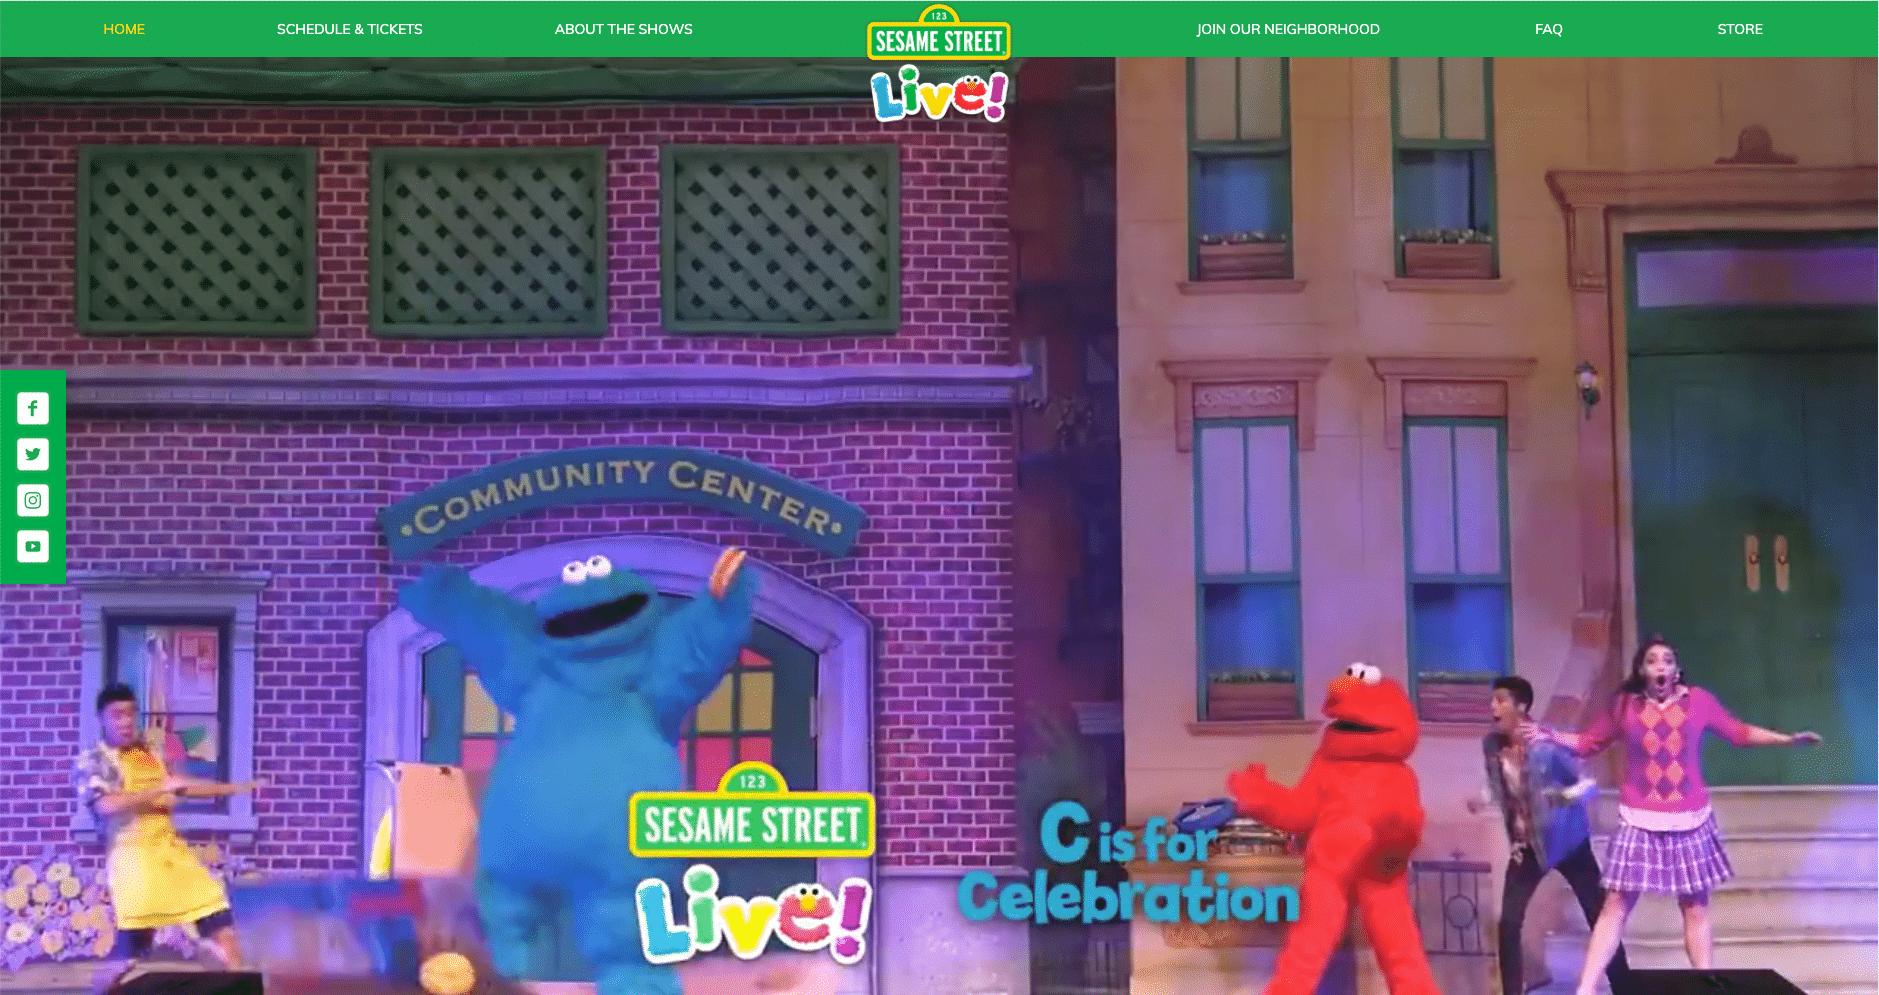 Sesame Street Live(ショーのチケット販売)